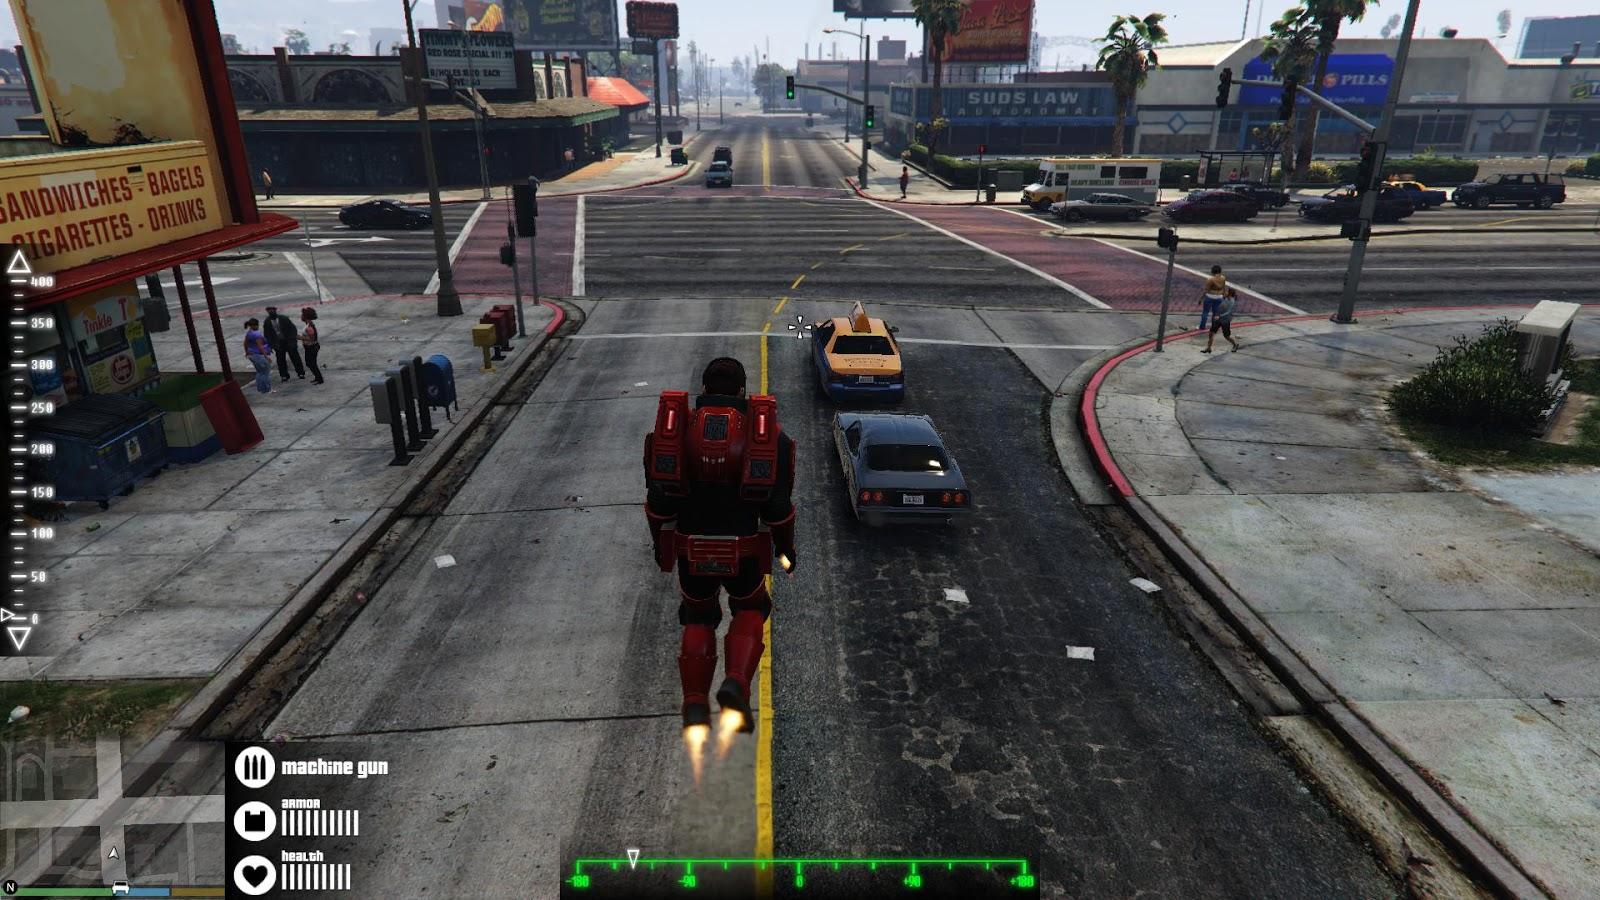 IronmanV script mod - Mods pour GTA V sur GTA Modding